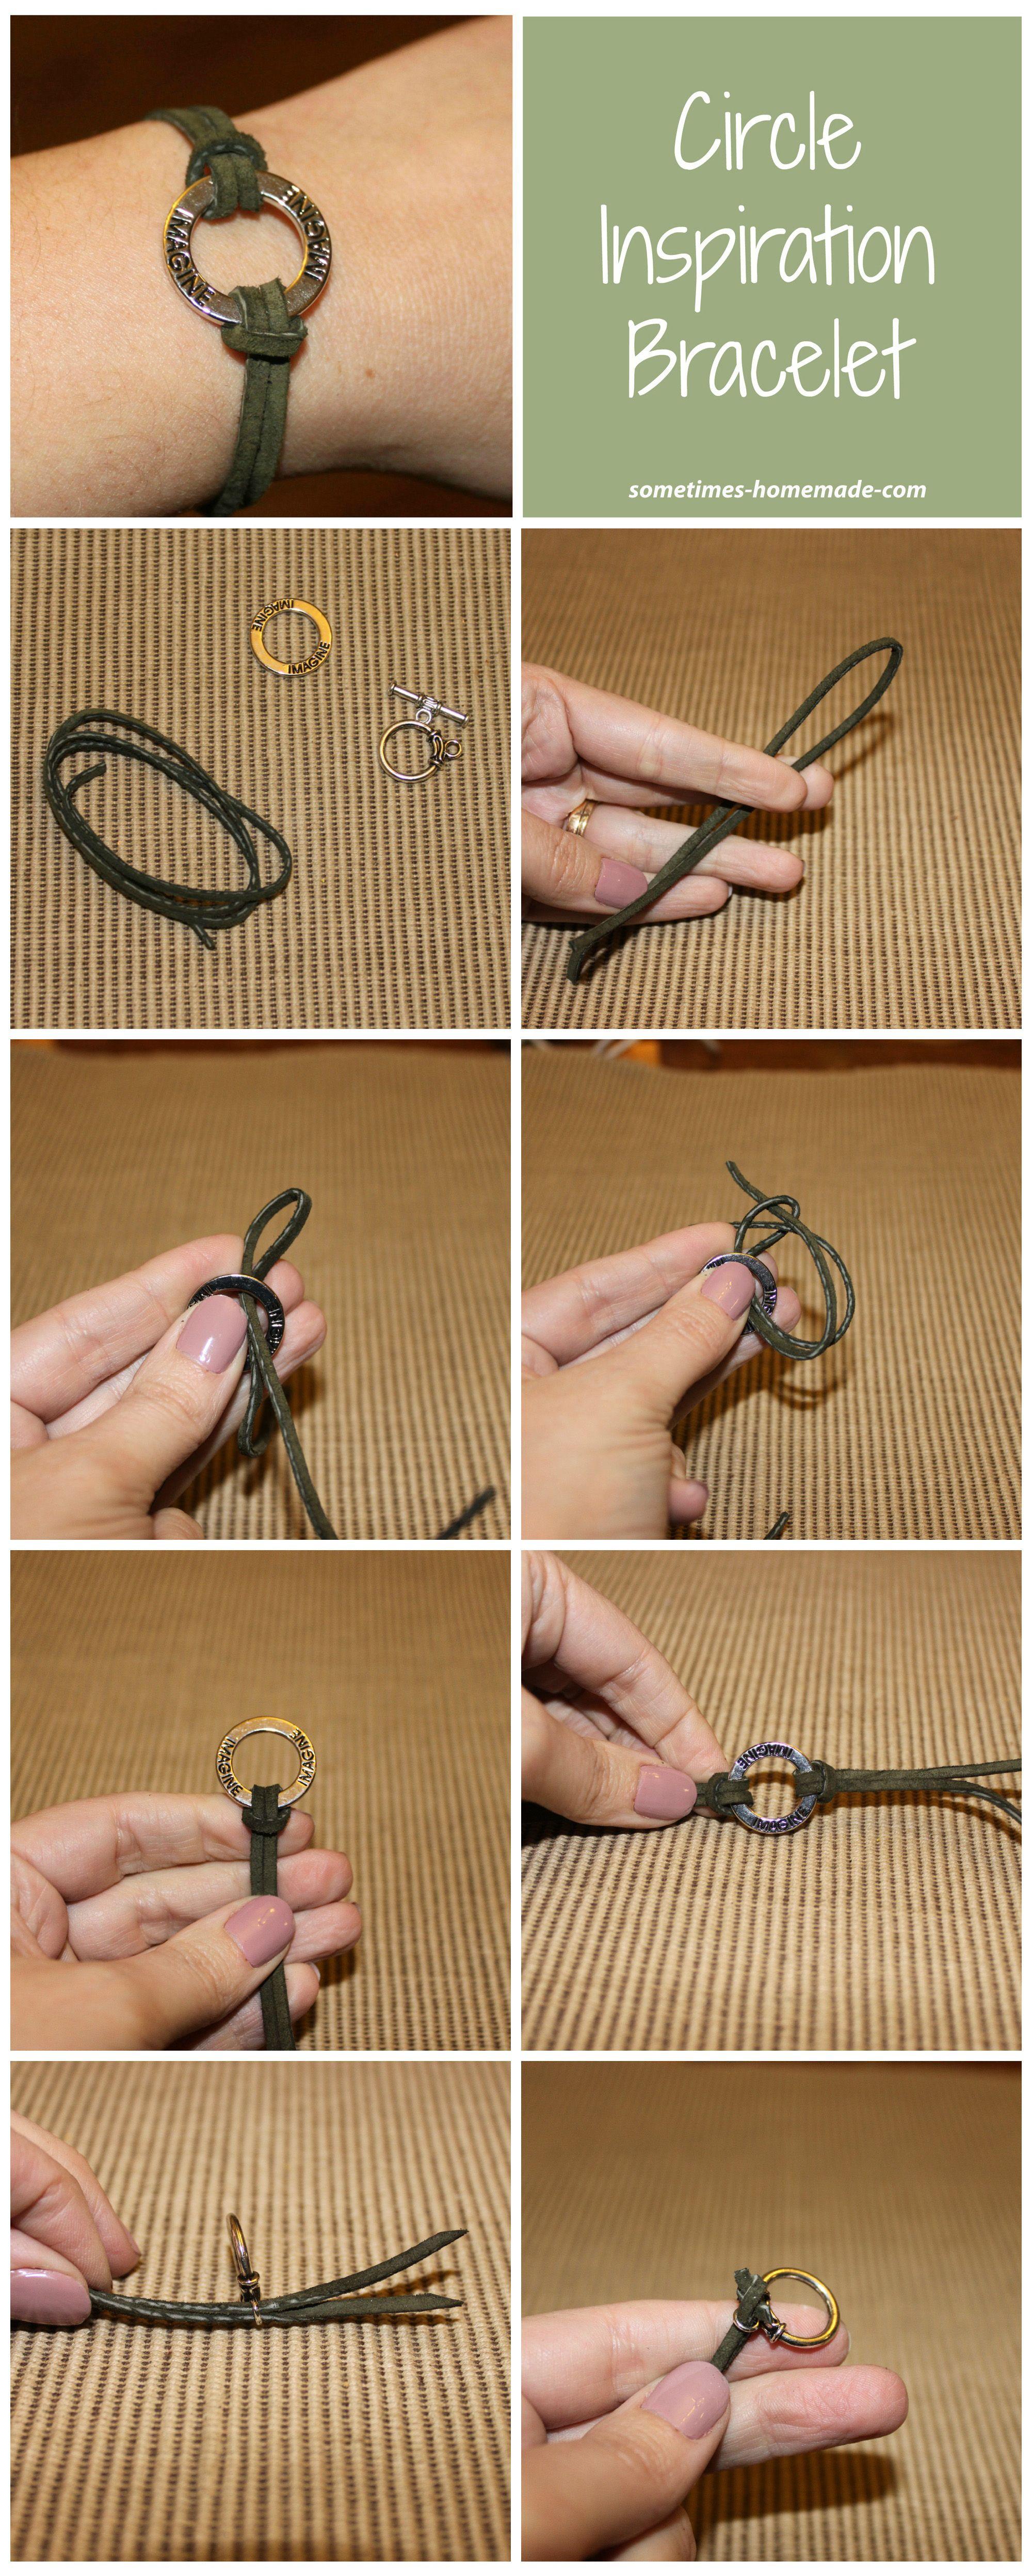 Circle inspiration bracelet leather bracelet tutorial